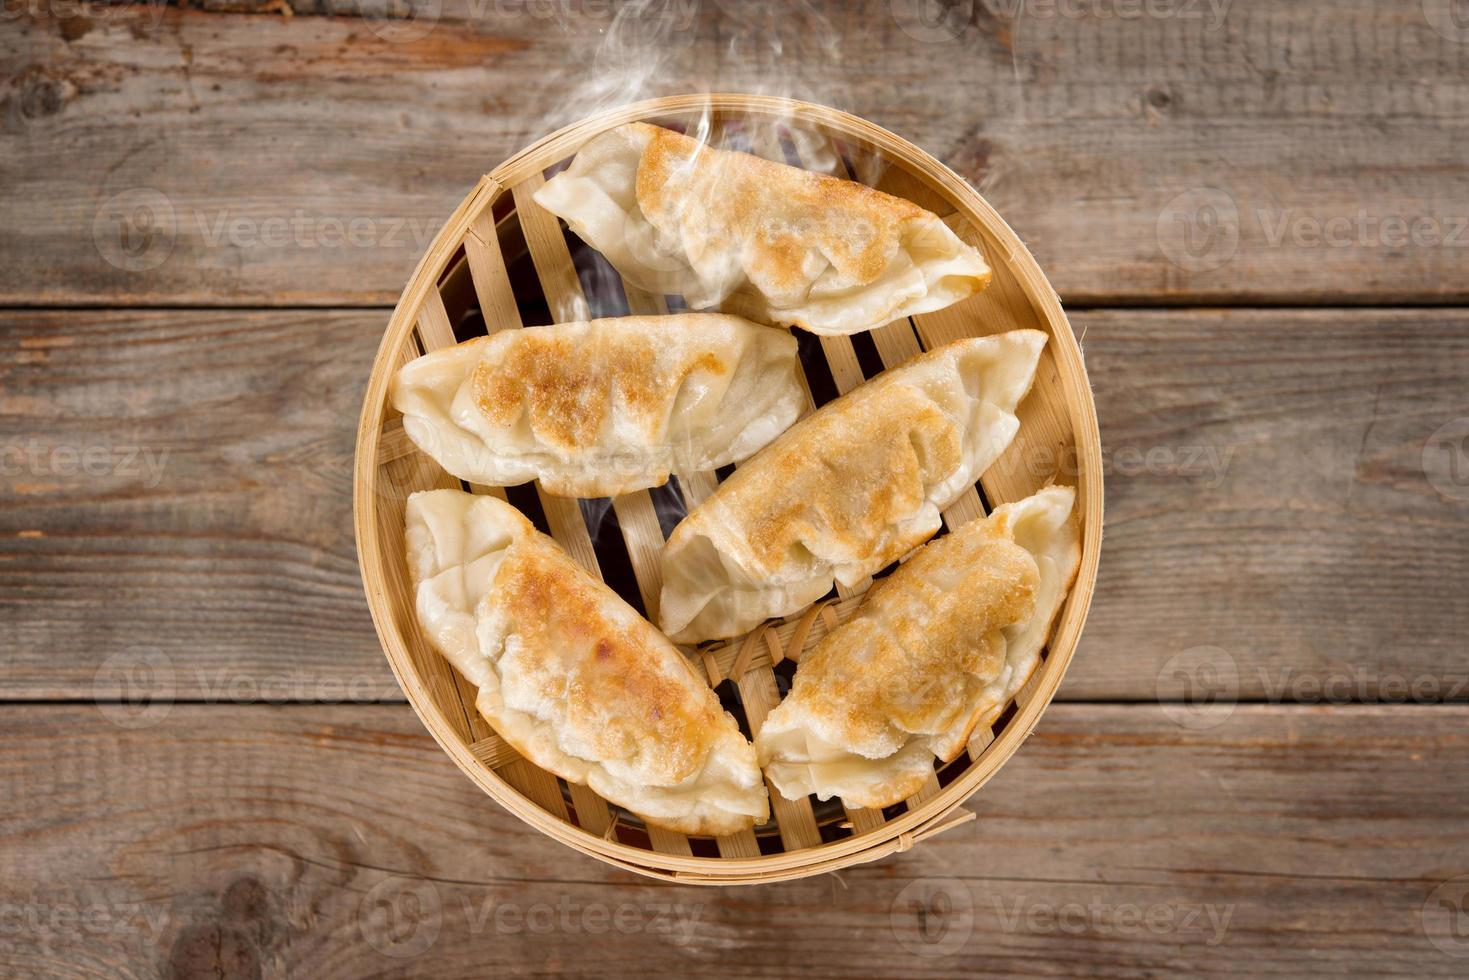 Chinese keuken pan gebakken dumplings foto